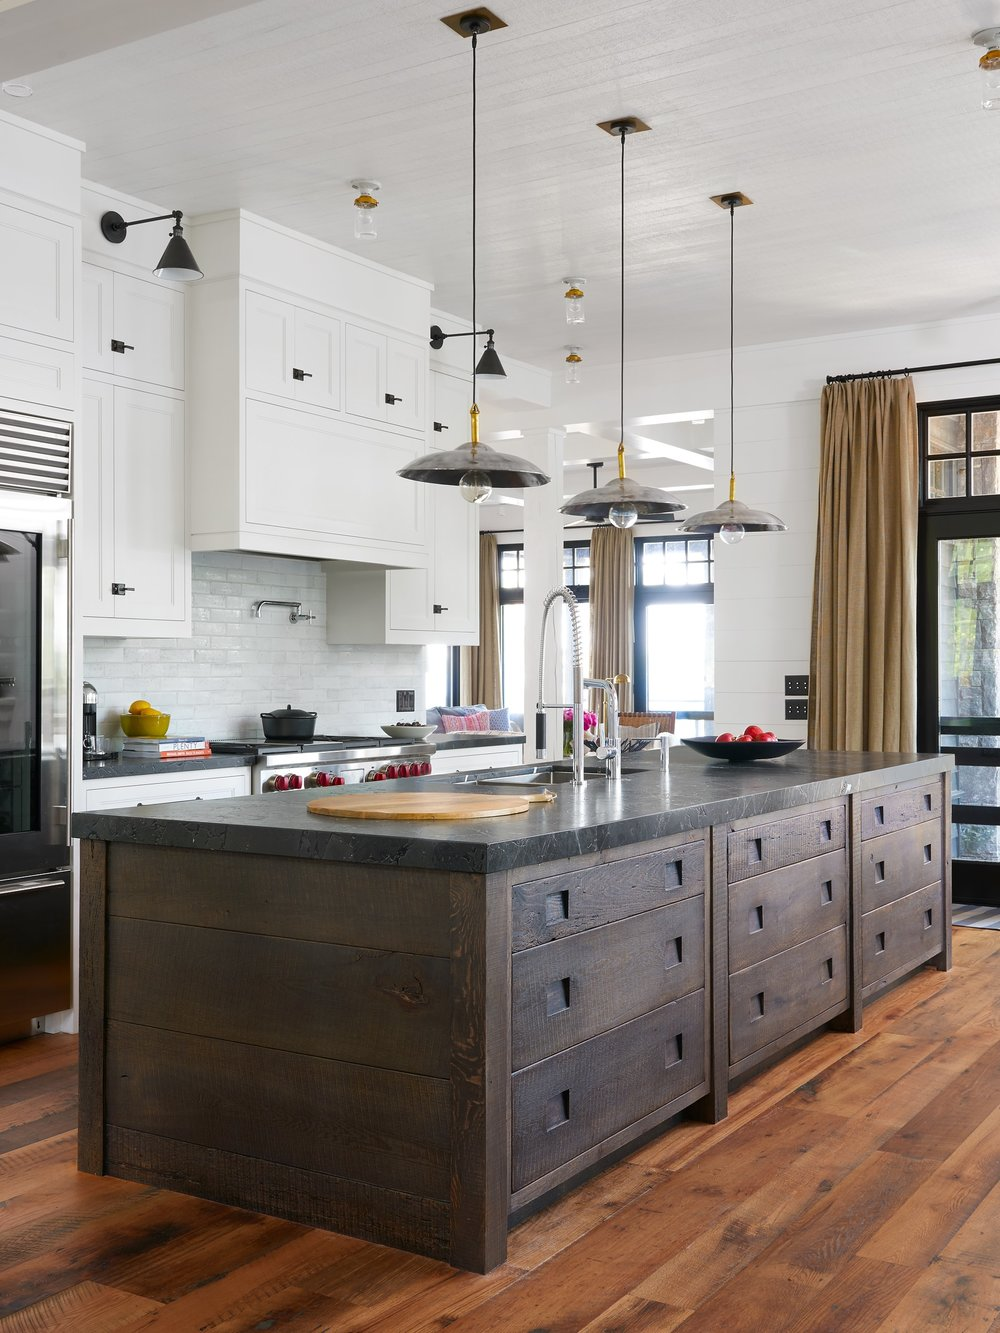 jennifer.worts.design.portfolio.interiors.kitchen.1501106064.9985256.jpg